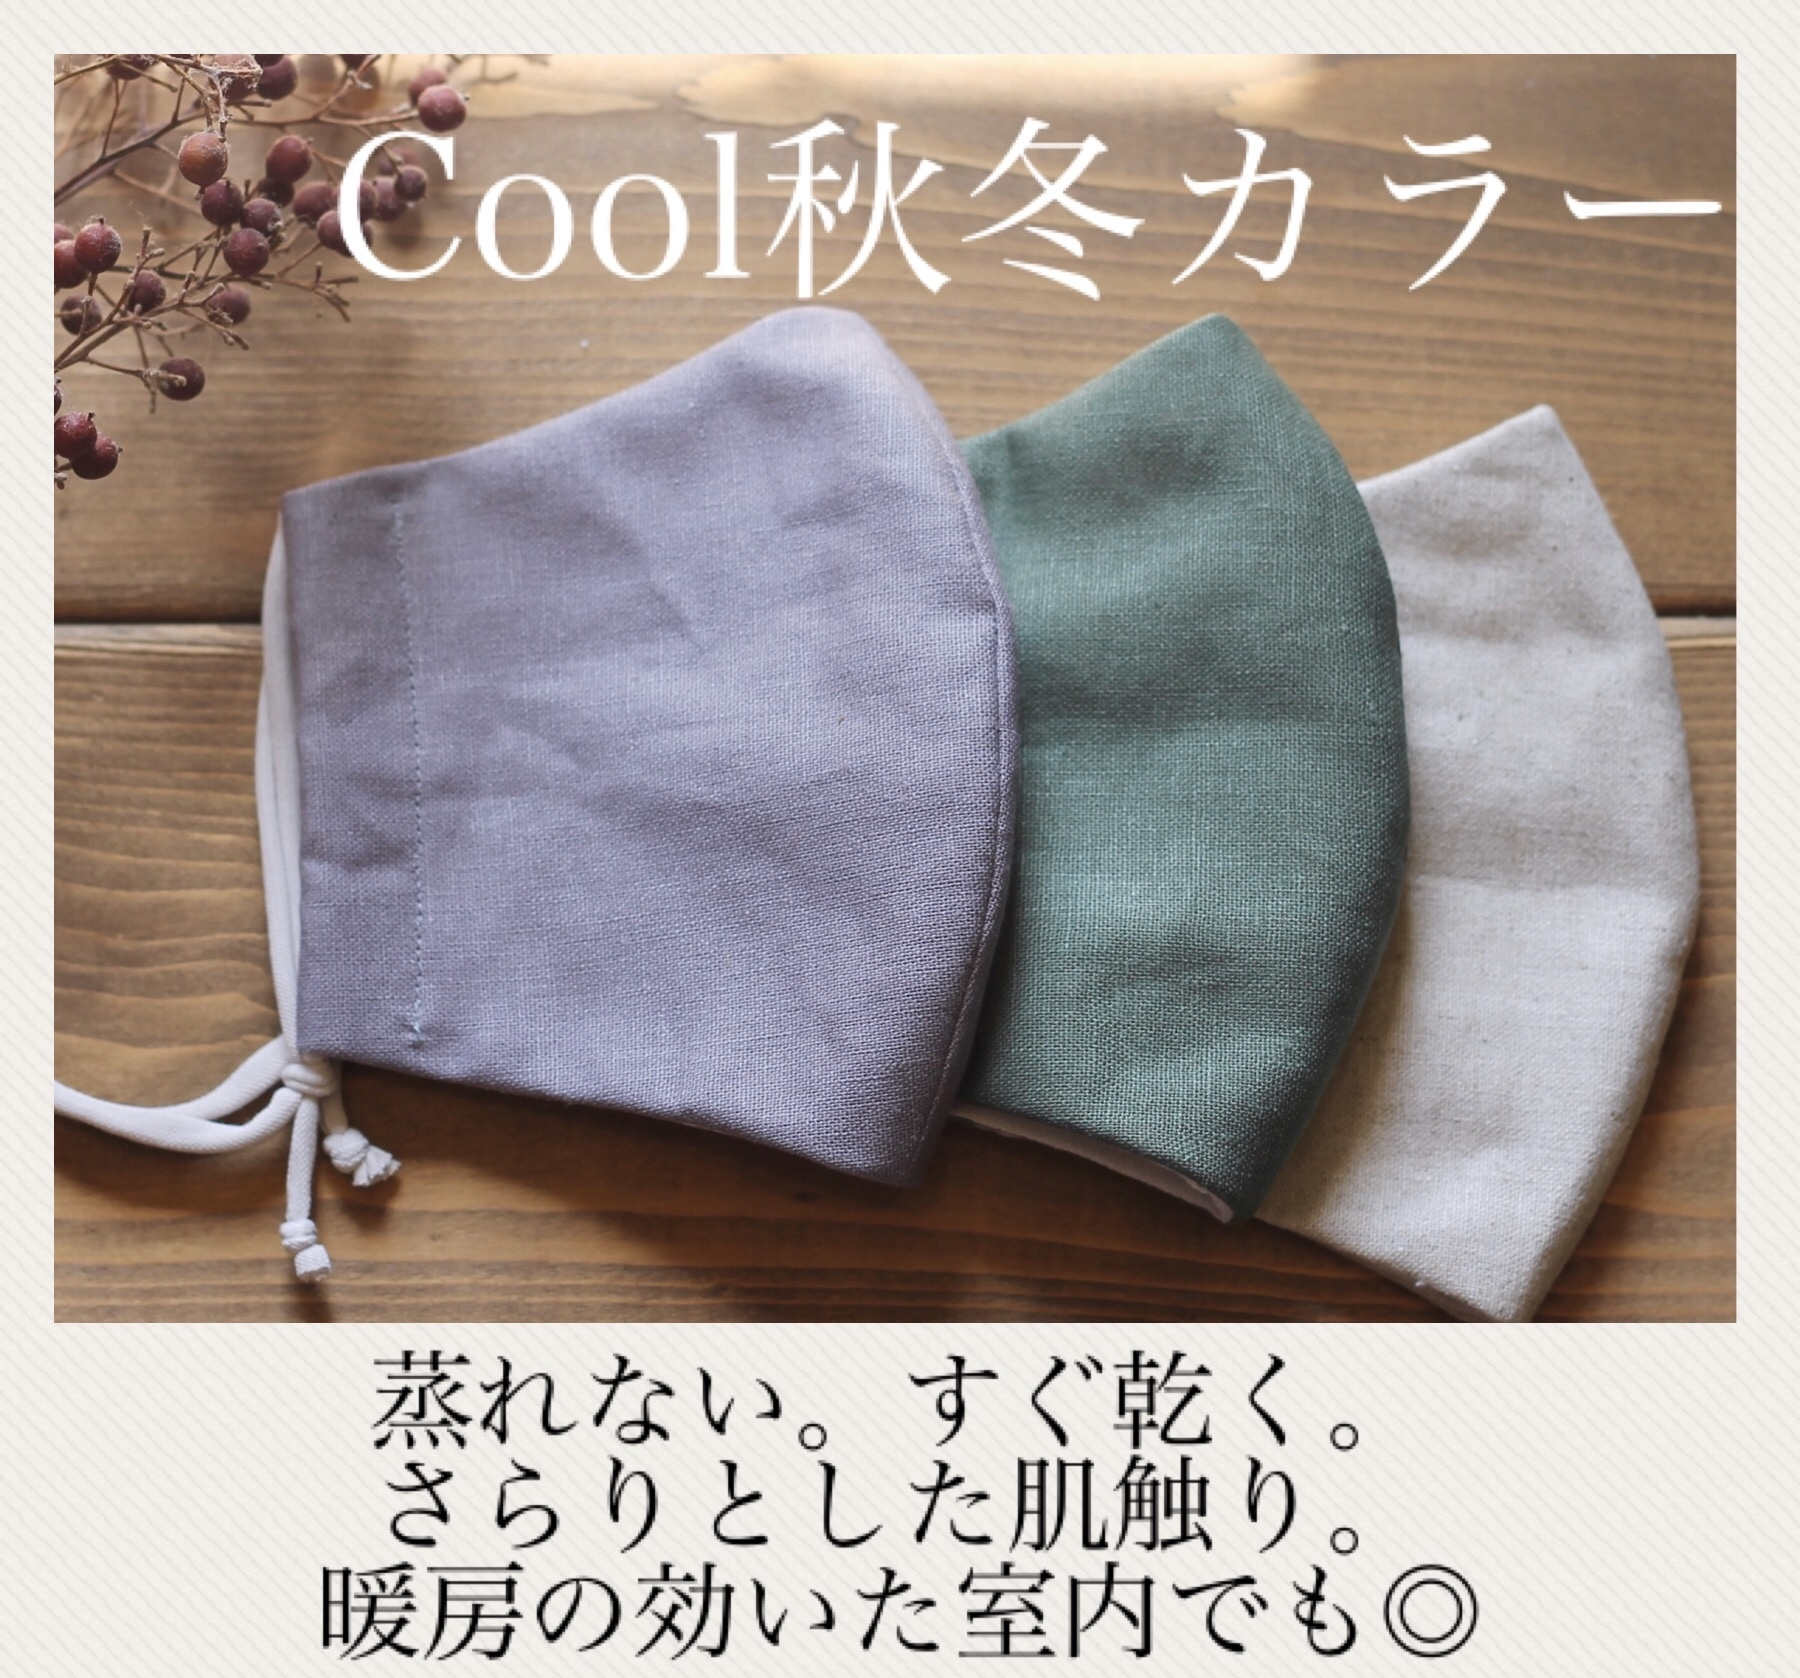 Coolマスク秋冬カラー